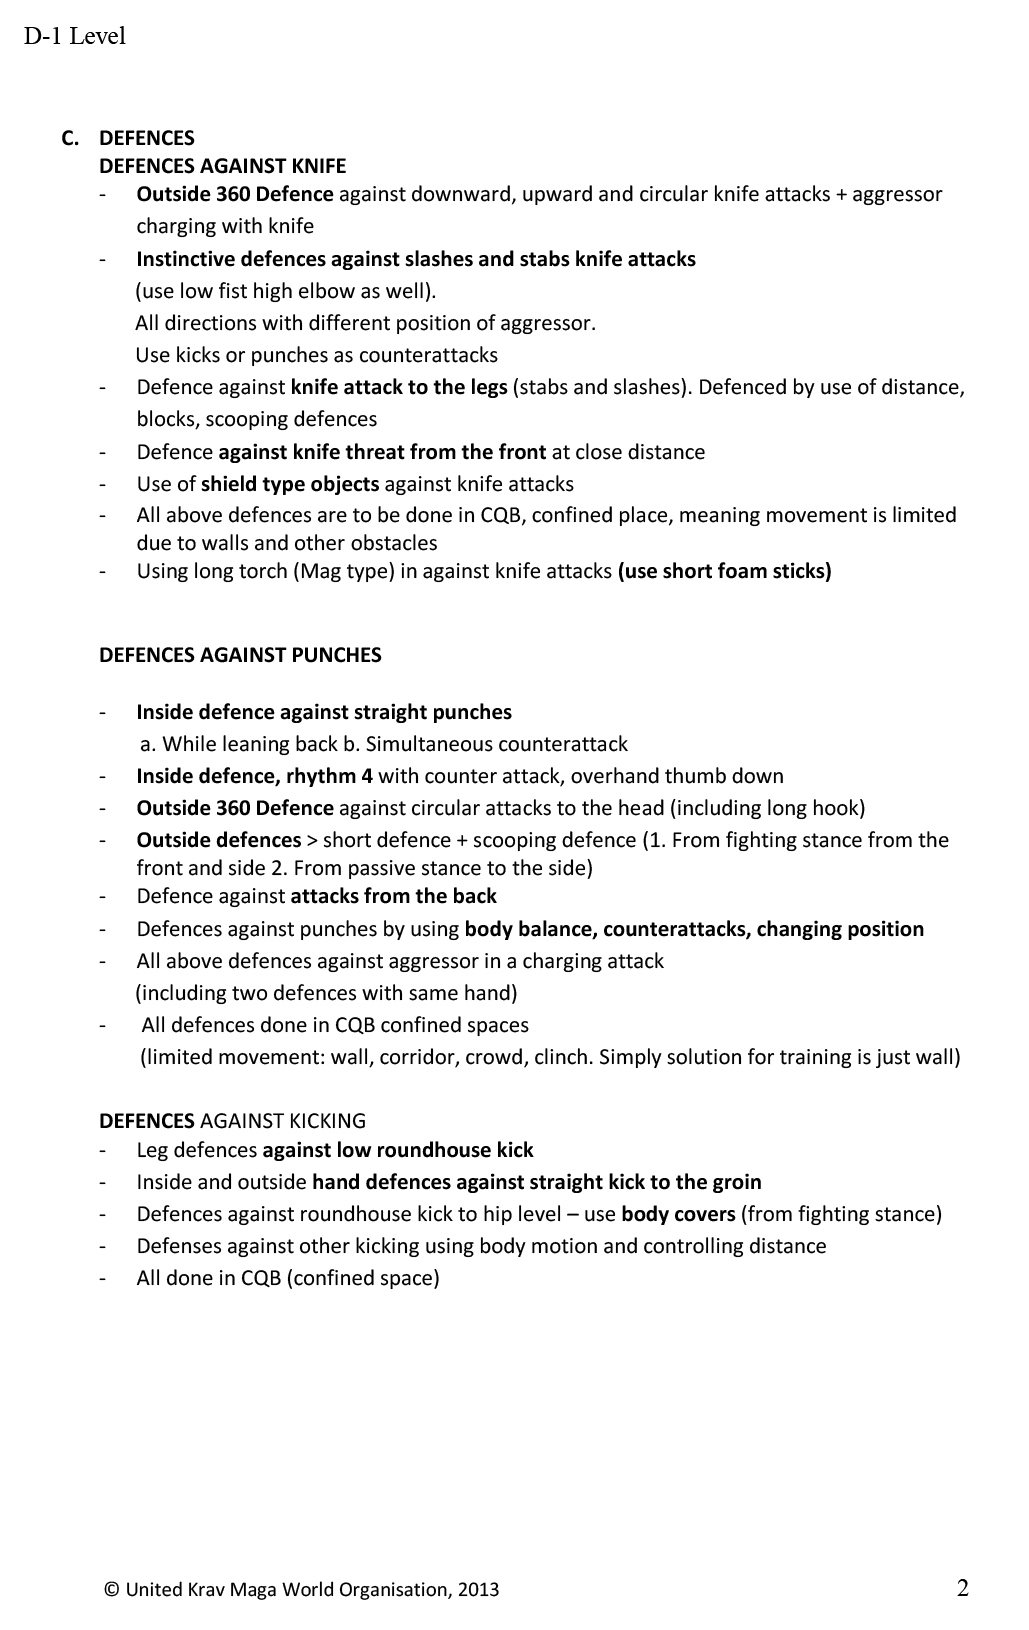 D1_ENGLISH.pdf-2.jpg